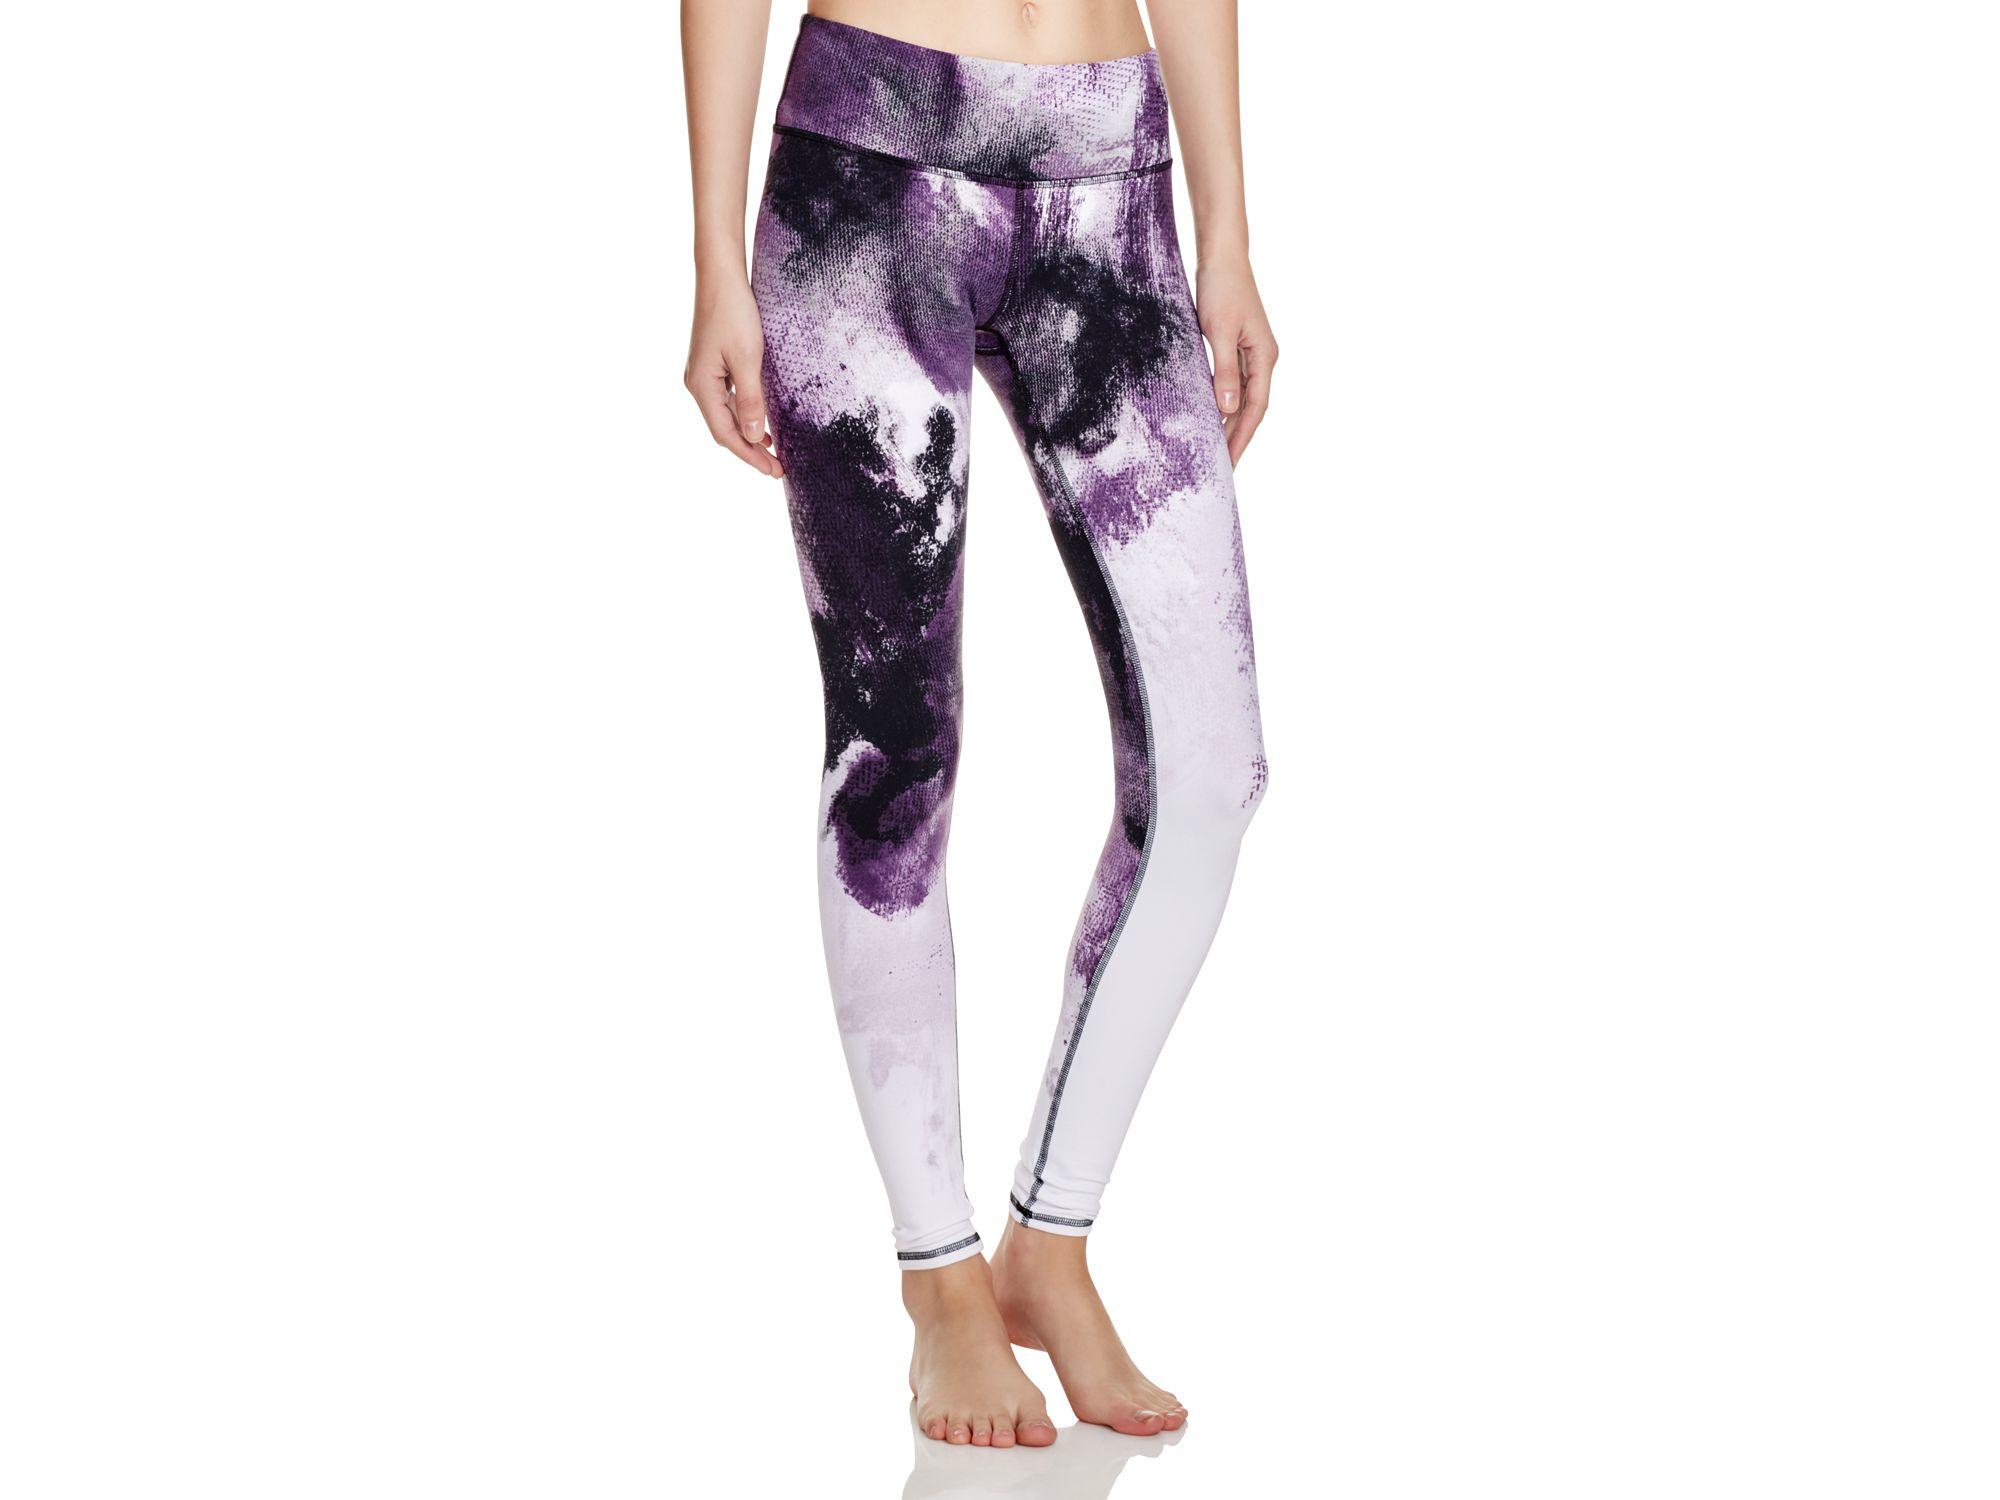 8c995fc65e Alo Yoga Airbrush Printed Leggings in Purple - Lyst